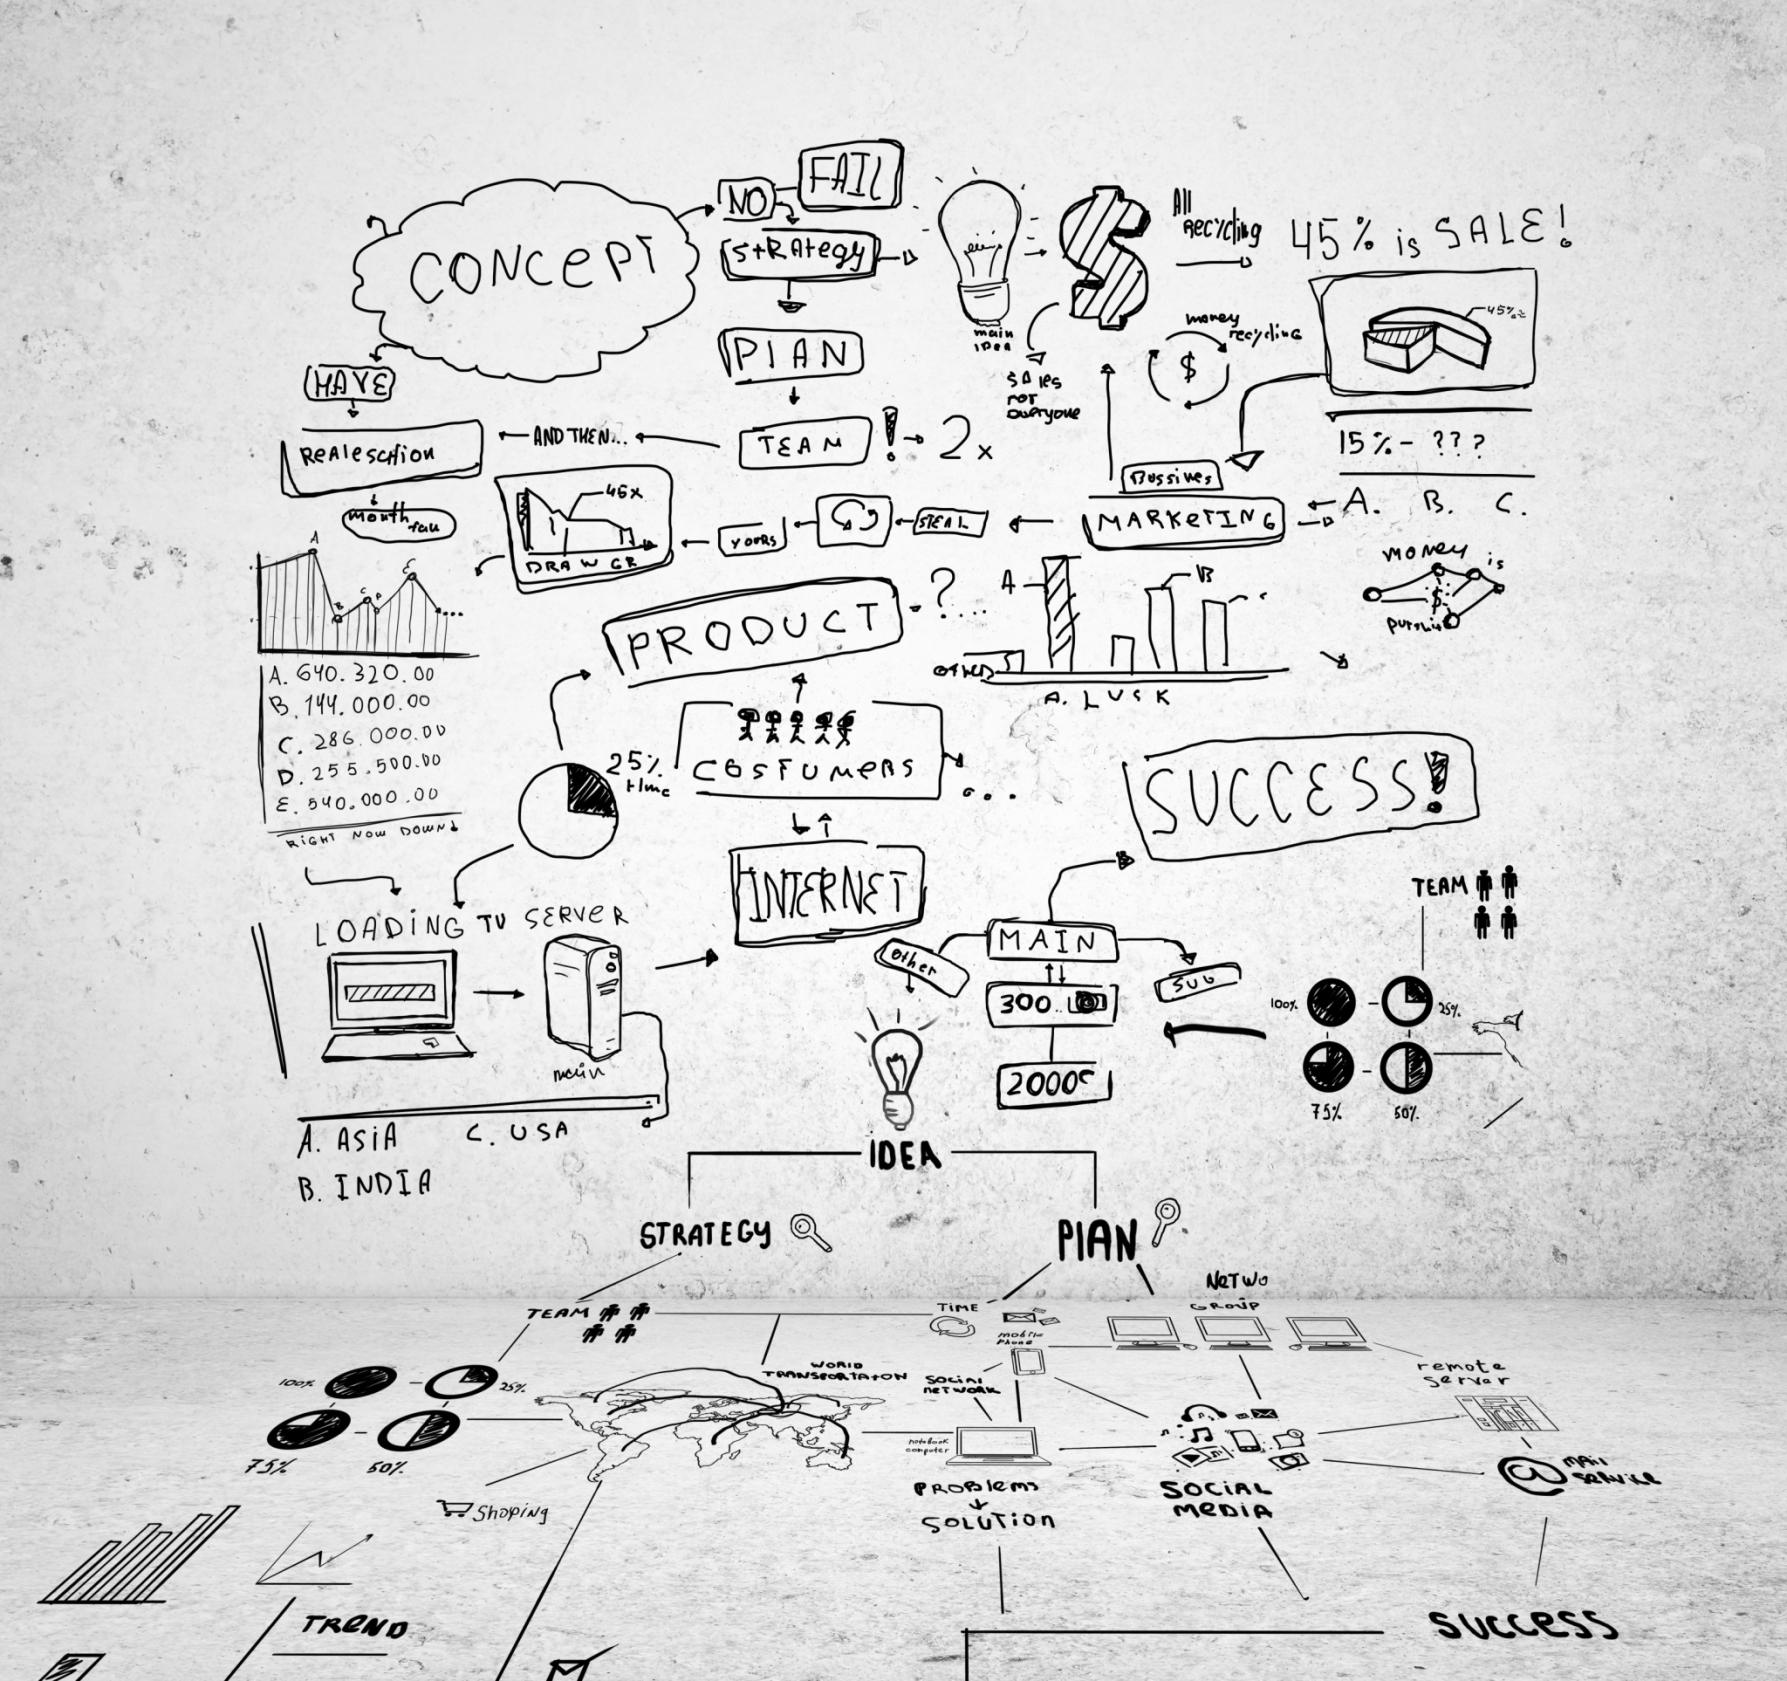 Brainstorming Creative Content Ideas